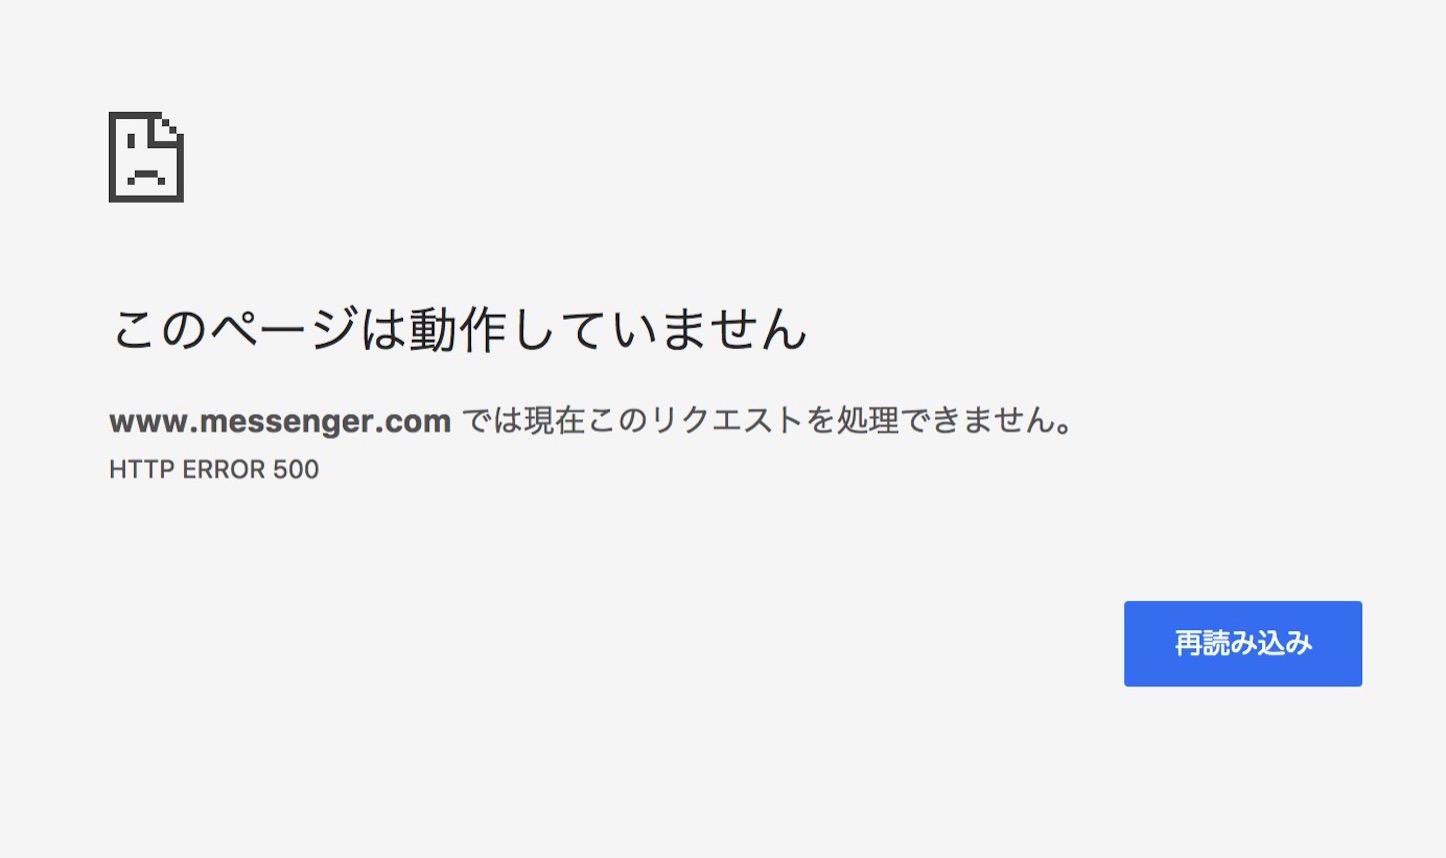 Facebook-Messenger-Is-Down.jpg